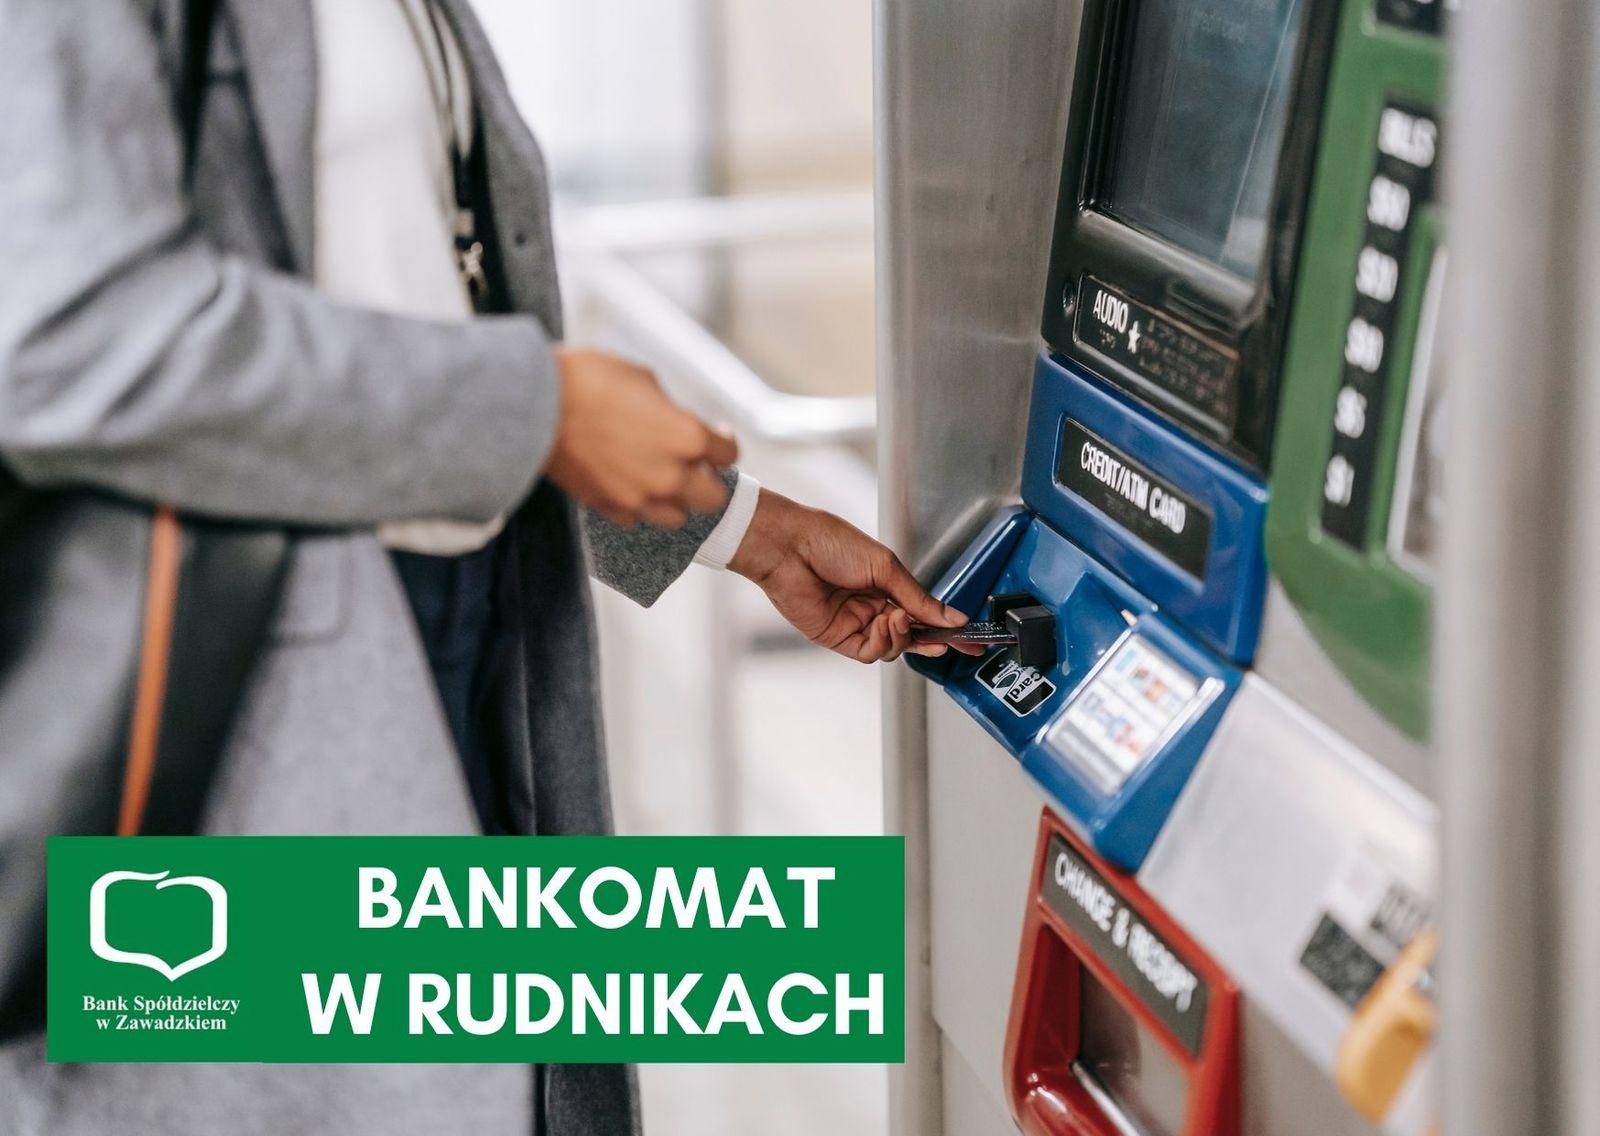 Bankomat w Rudnikach.jpeg